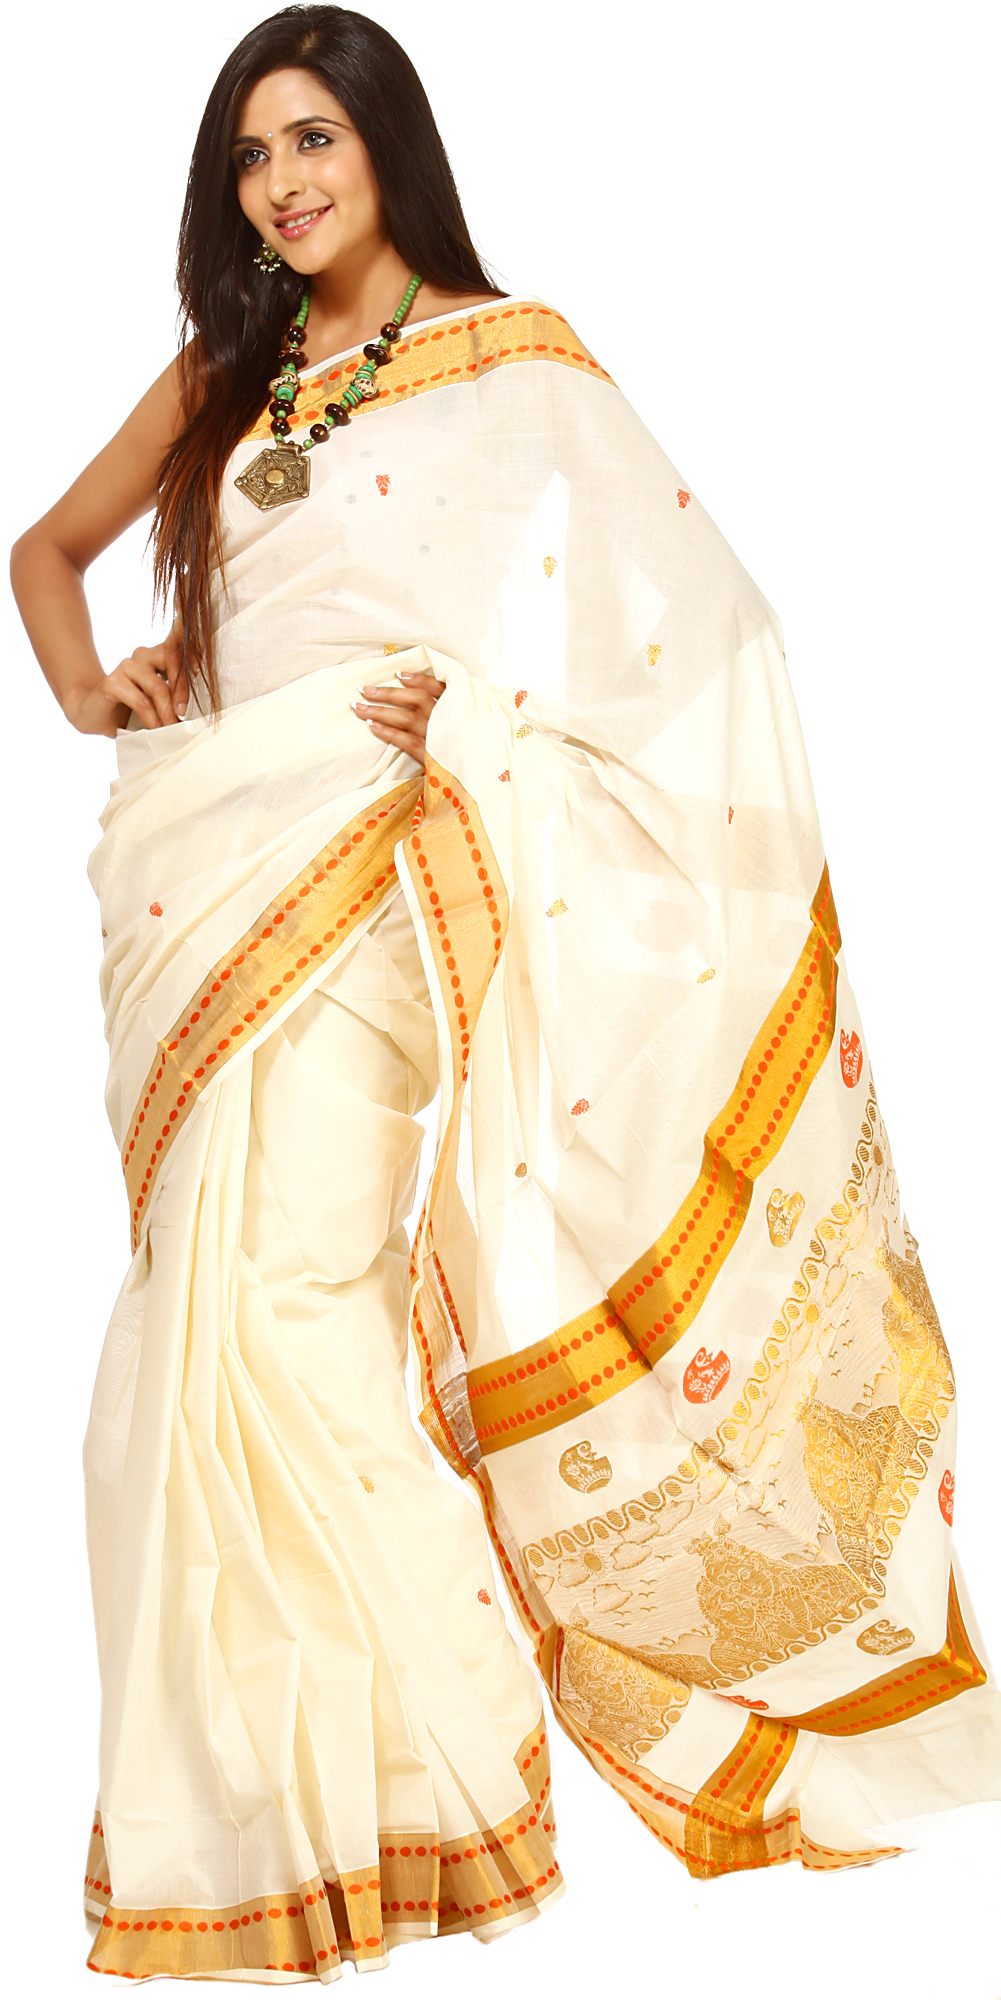 Ivory Kasavu Cotton Sari From Kerala With Woven Radha And Krishna